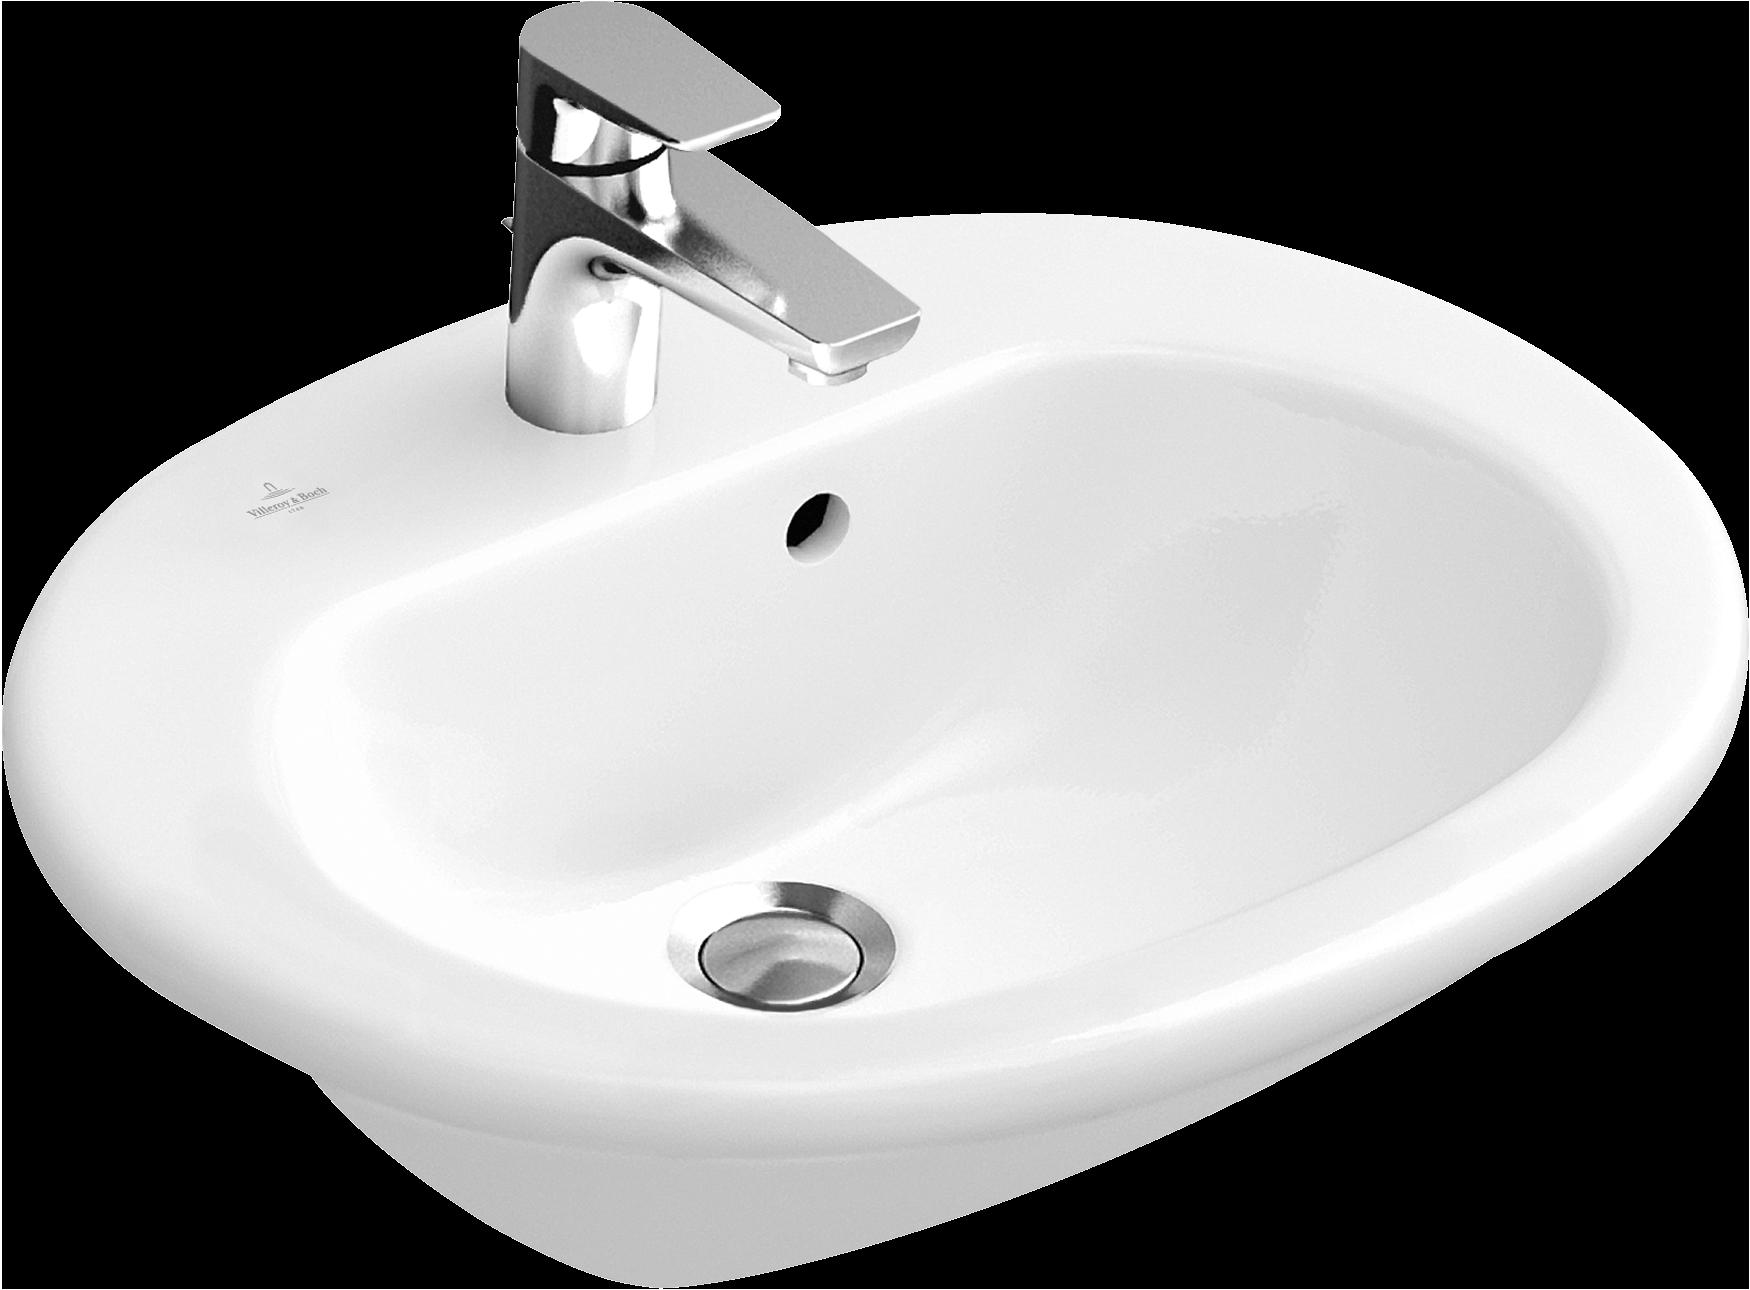 Semi recessed washbasin oval 416055 villeroy boch for Vasque salle de bain villeroy et boch